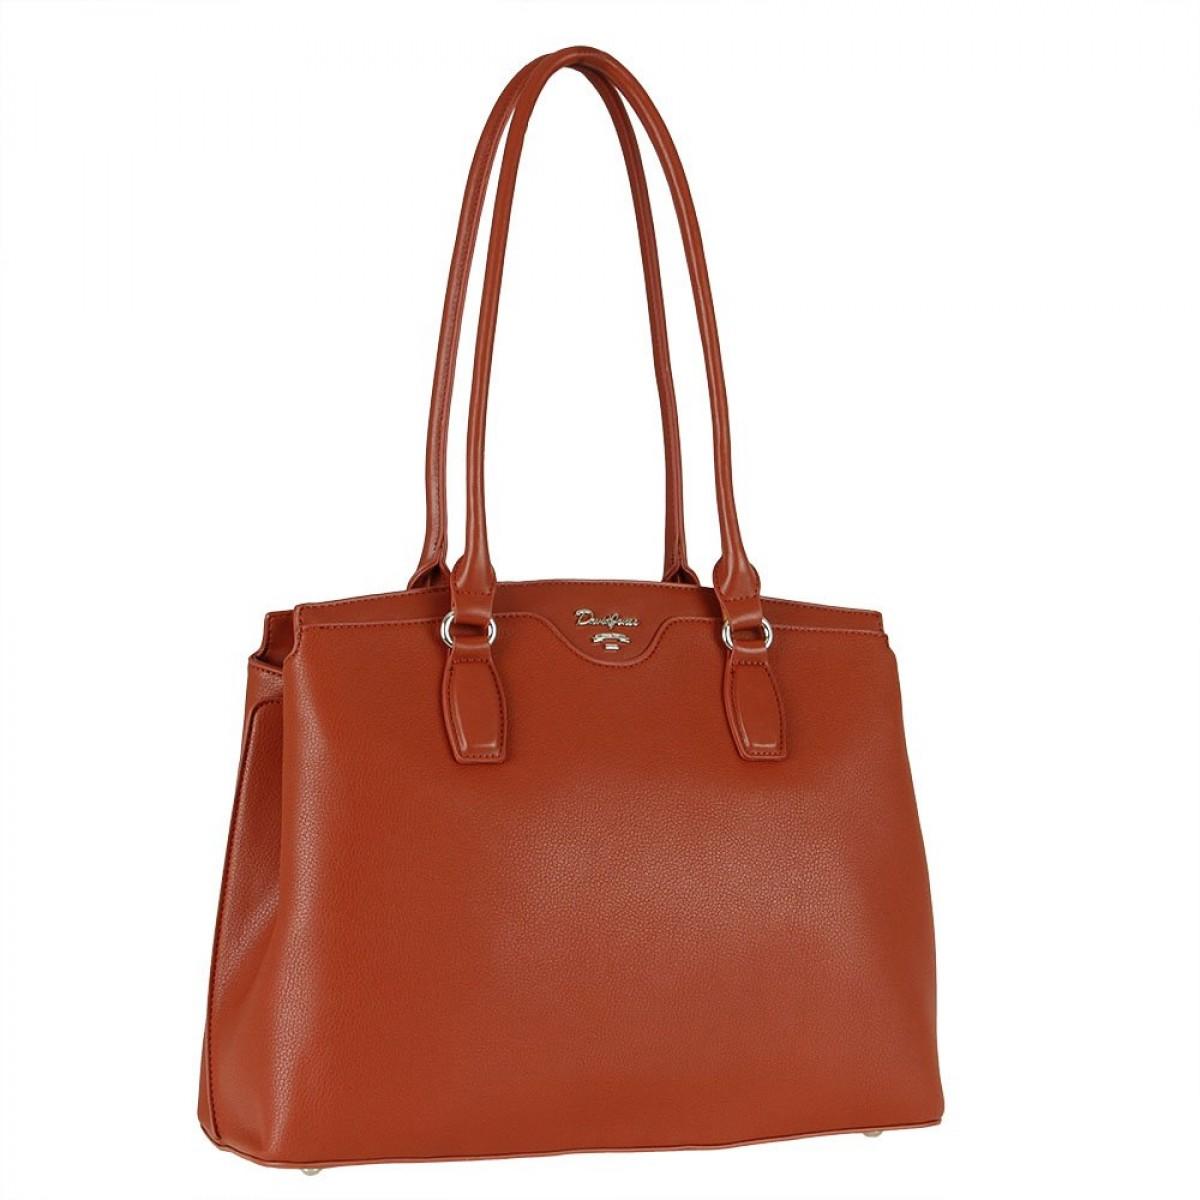 Жіноча сумка David Jones 6416-2 SIENNA